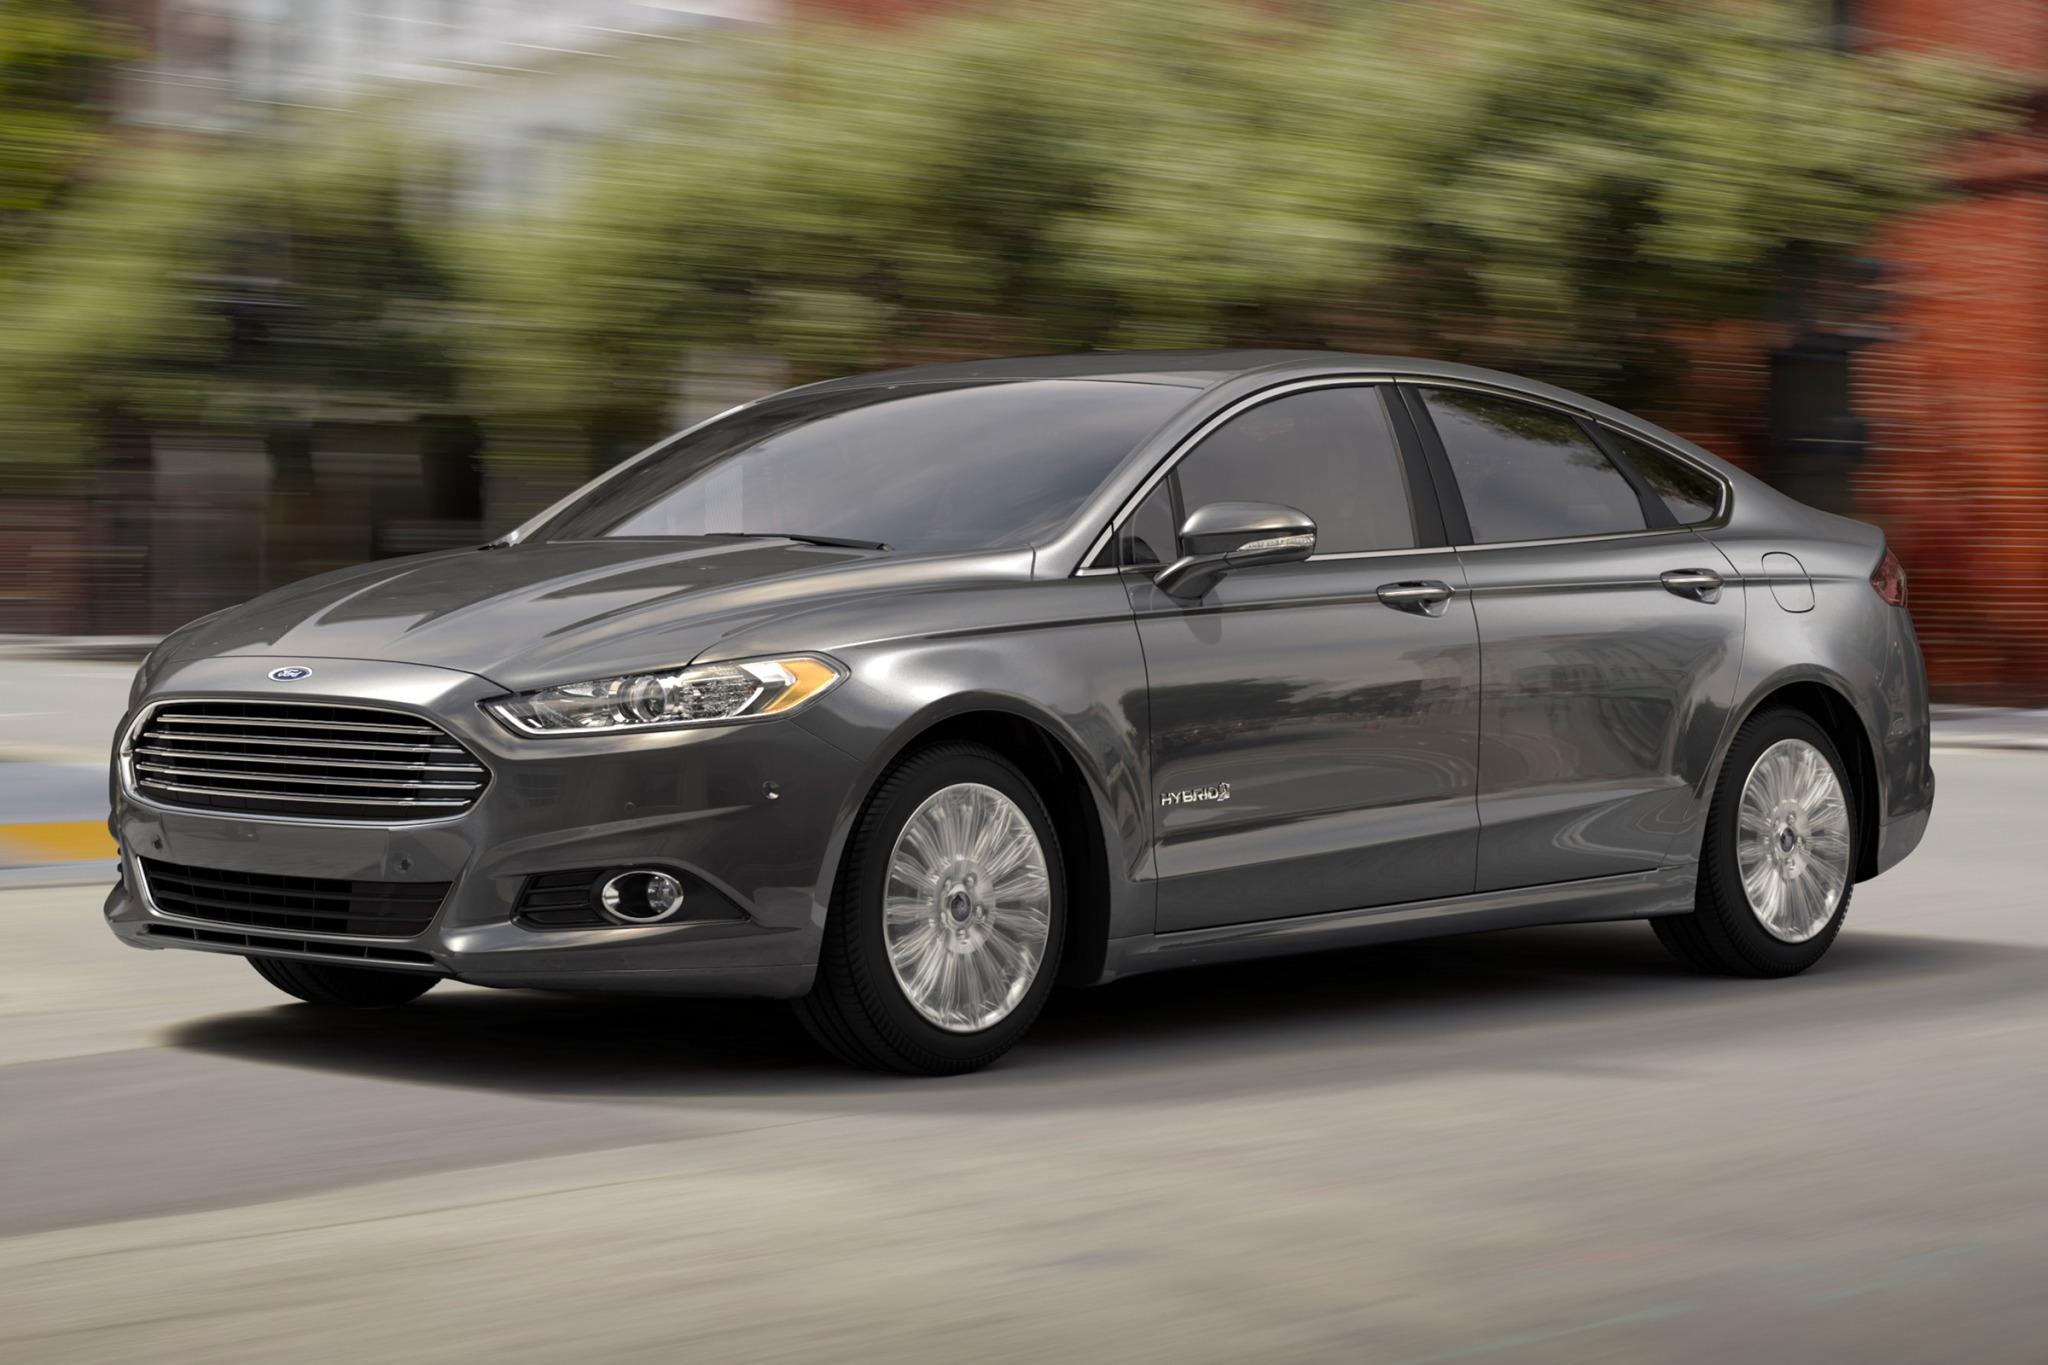 2017 Ford Fusion Hybrid Anium Exterior